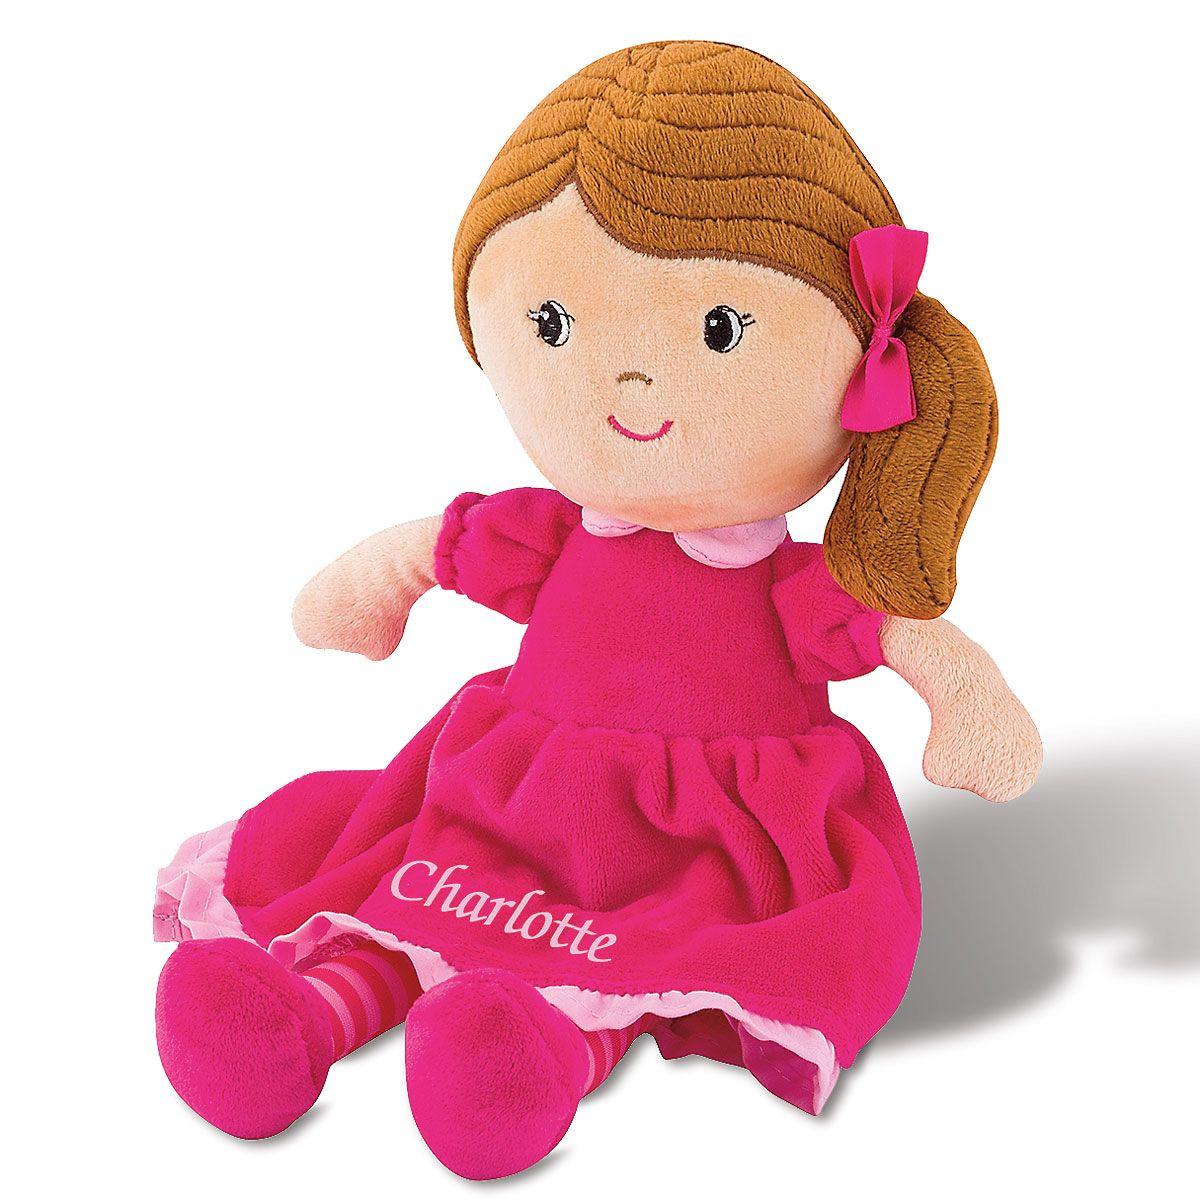 Brunette Personalized Doll by Stephen Joseph®